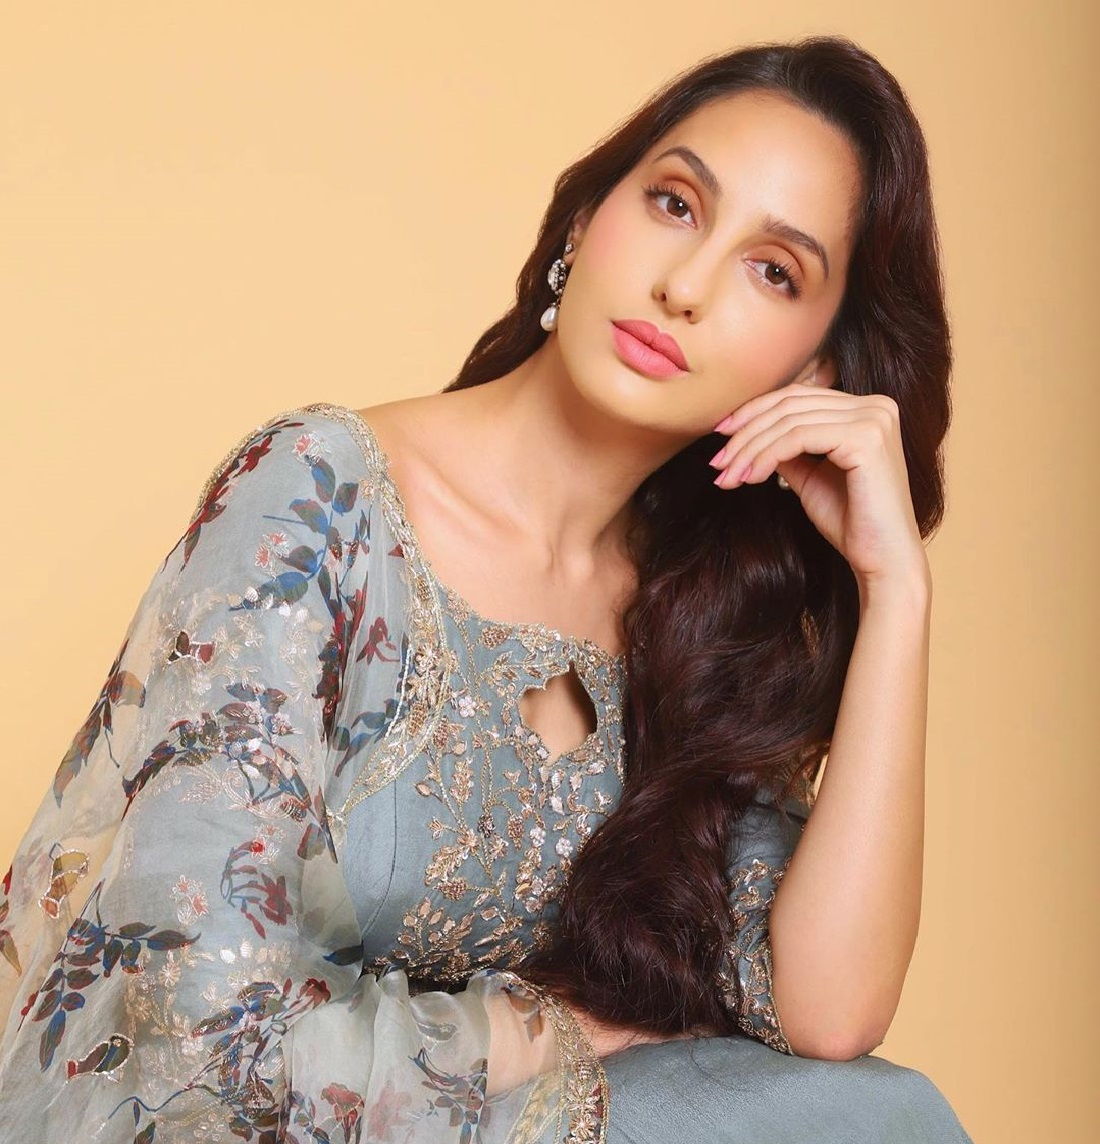 nora fatehi biography in hindi